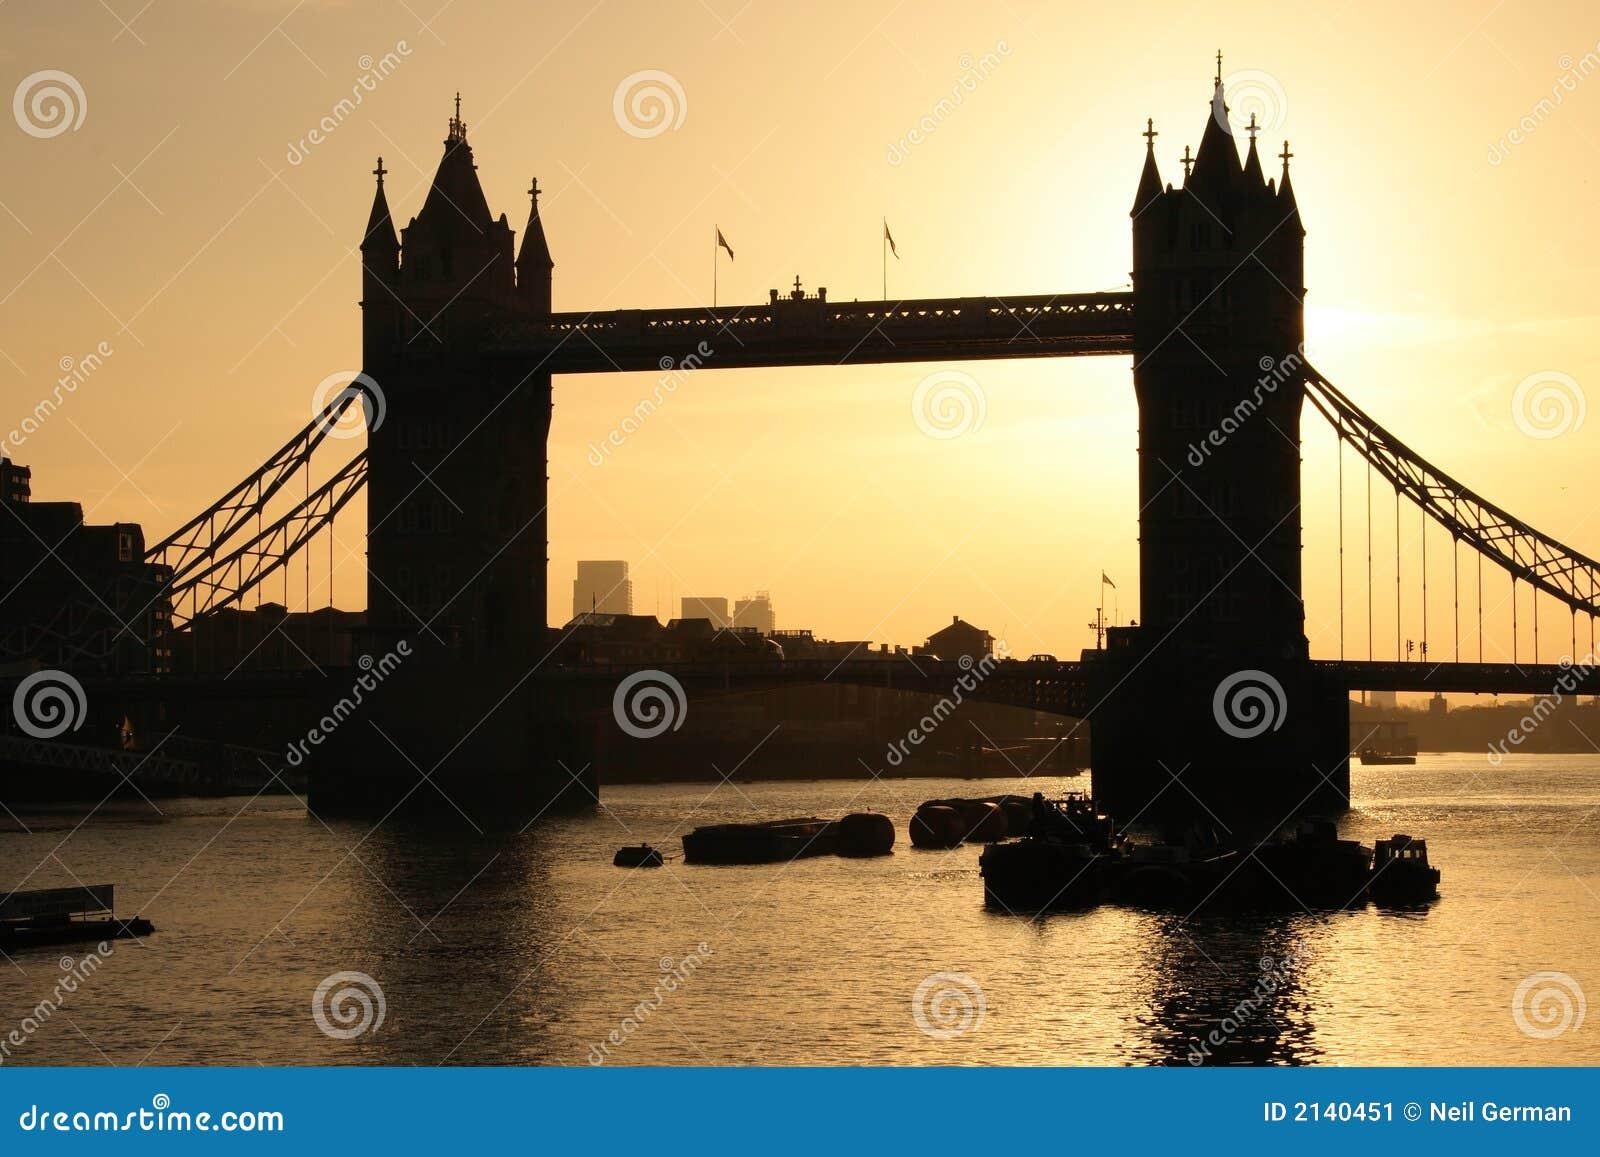 Dawn sunrise silhouette of tower bridge in london crossing over